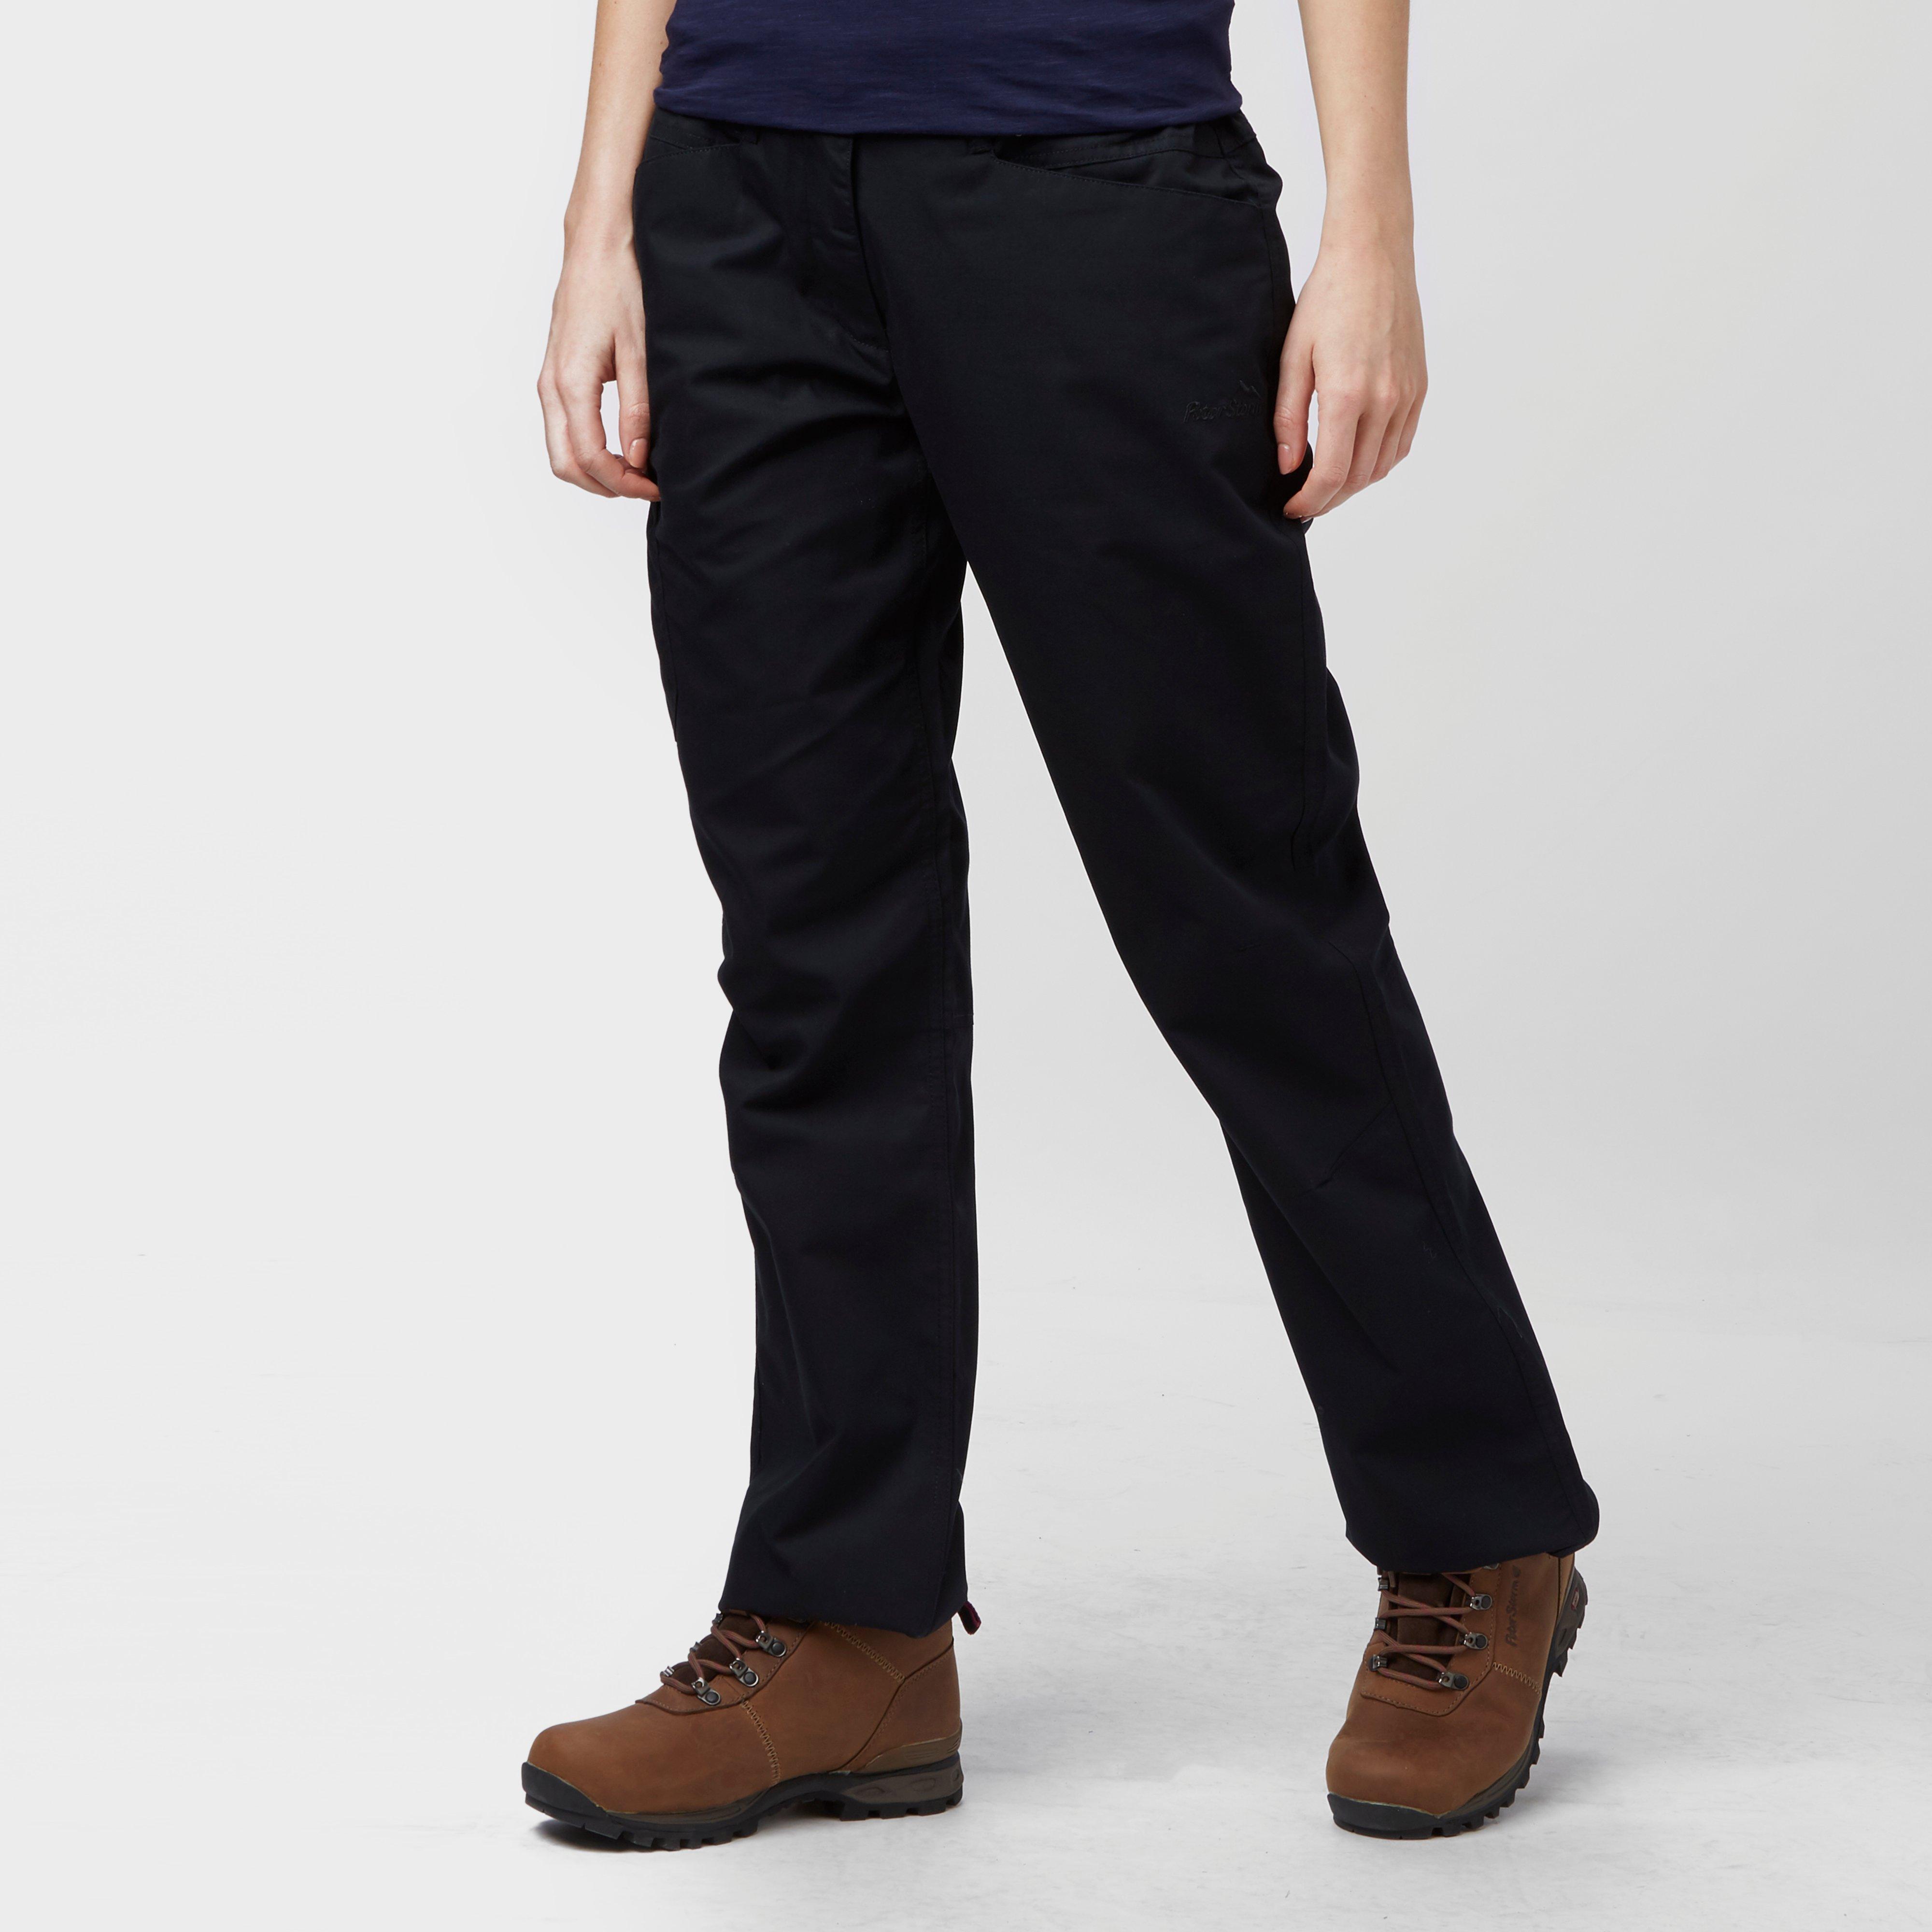 Peter Storm Peter Storm womens Ramble II Trousers (Long) - Black, Black